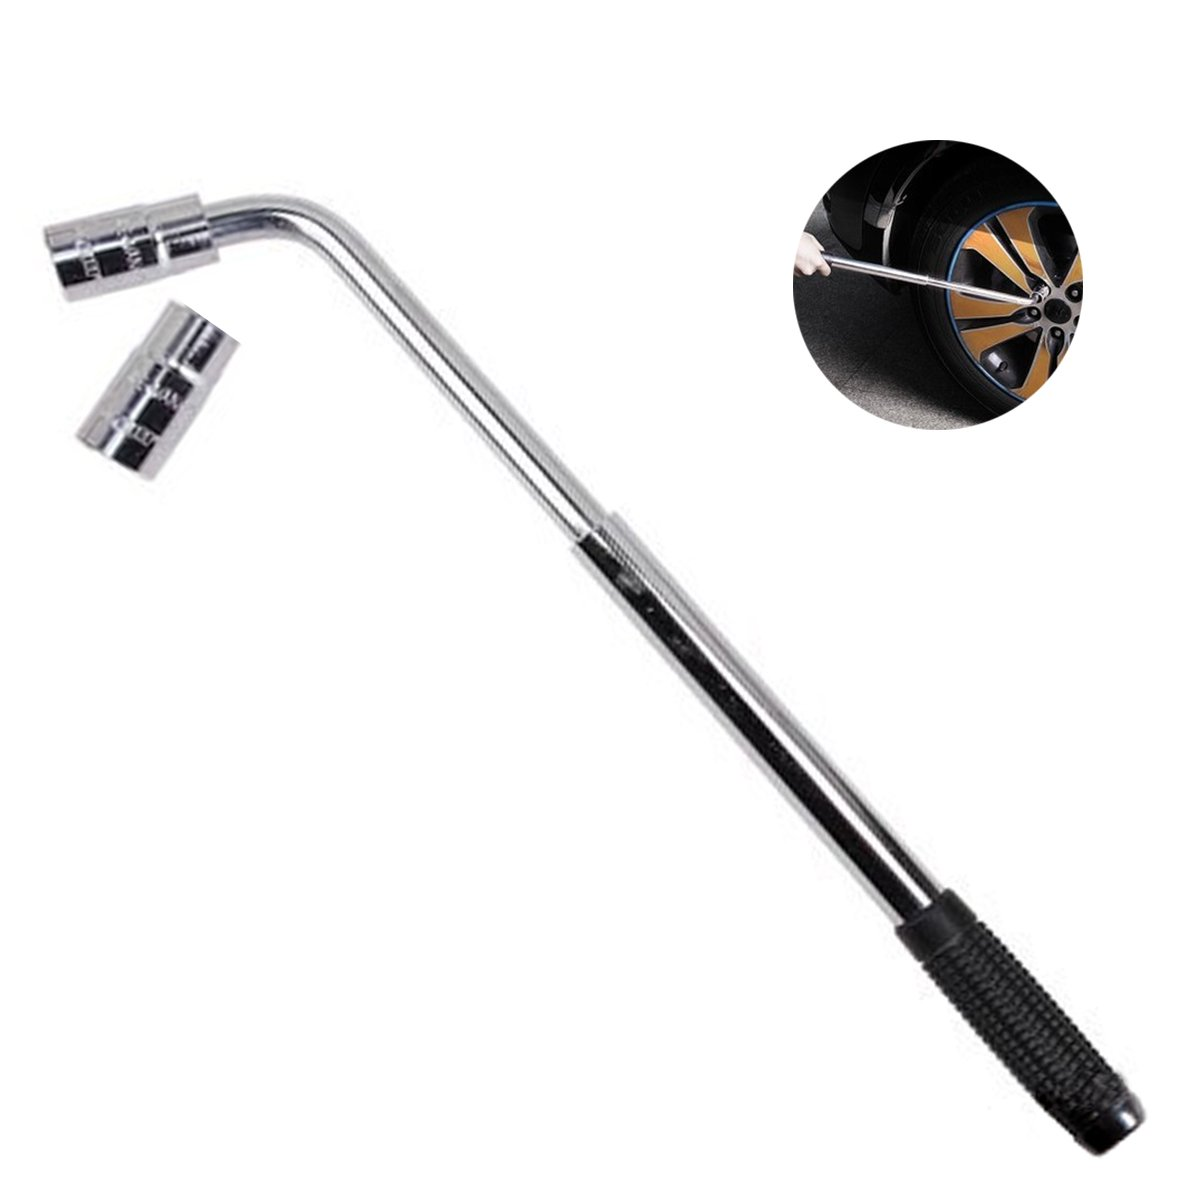 Jiele Wheel Wrench, Extendable Wheel Brace Wrench Nut Bolt Remover 17-19/21-31mm